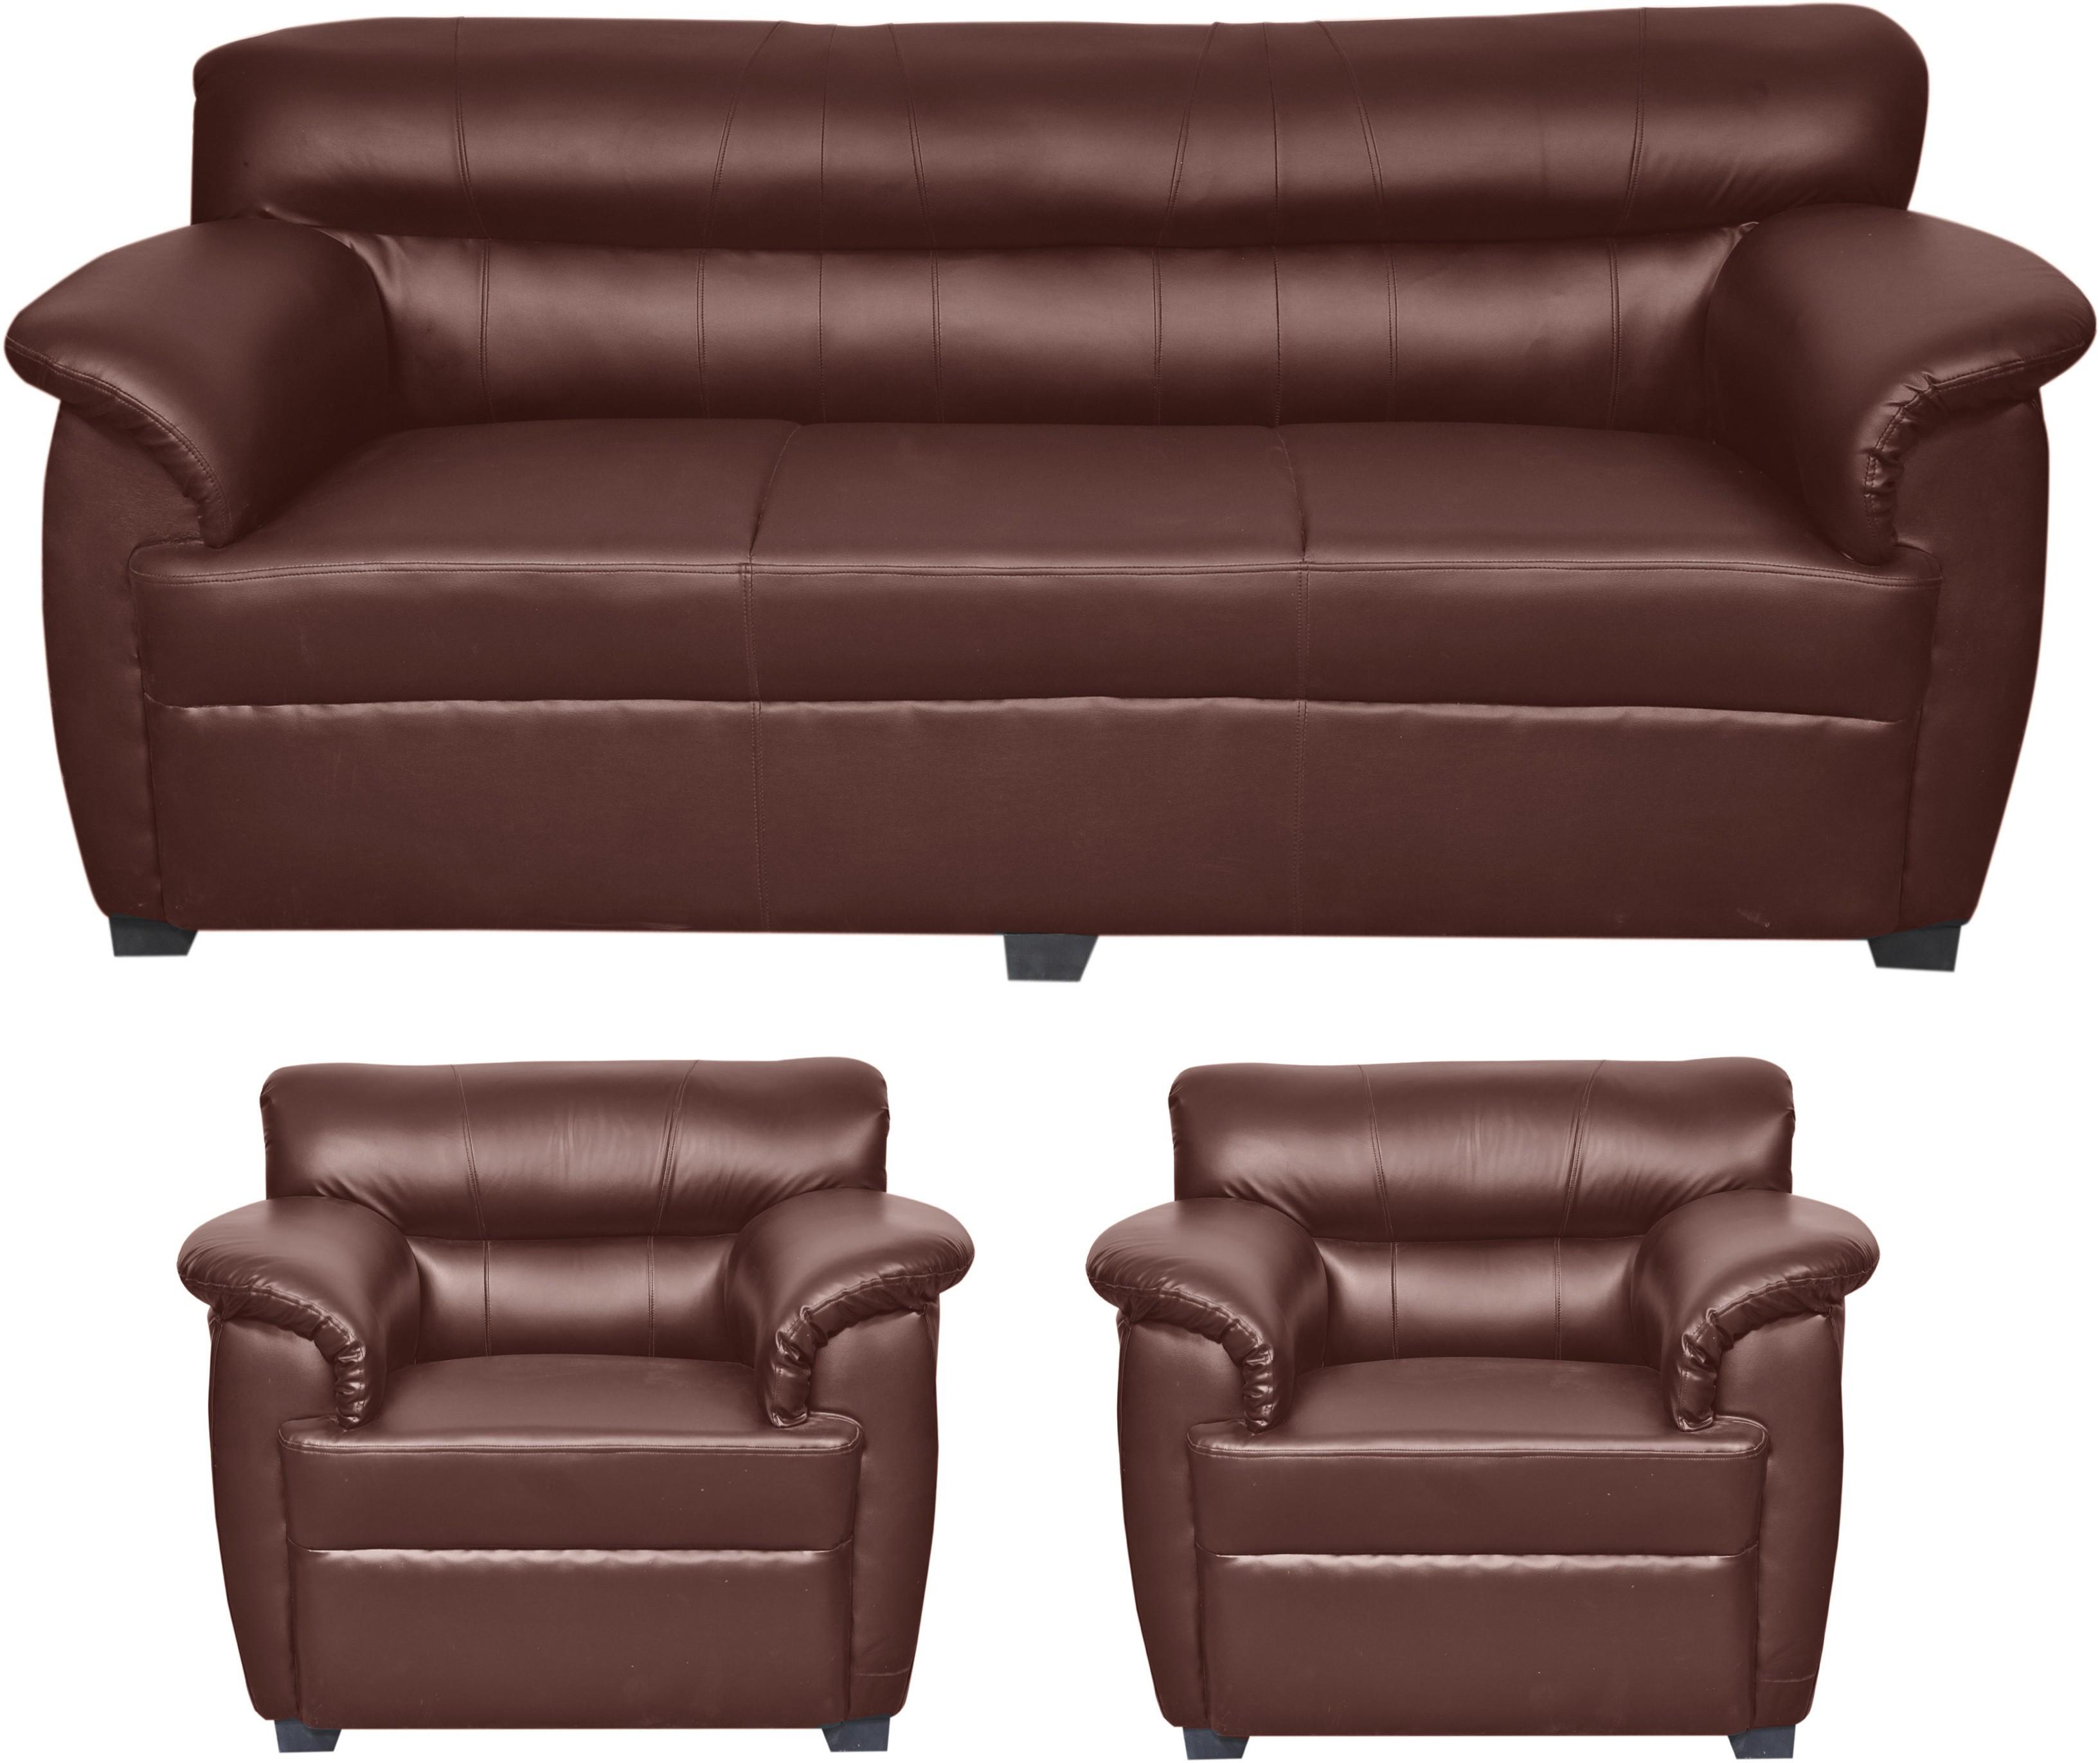 View HOMESTOCK Solid Wood 3 + 1 + 1 Brown Sofa Set(Configuration - Straight) Furniture (HOMESTOCK)